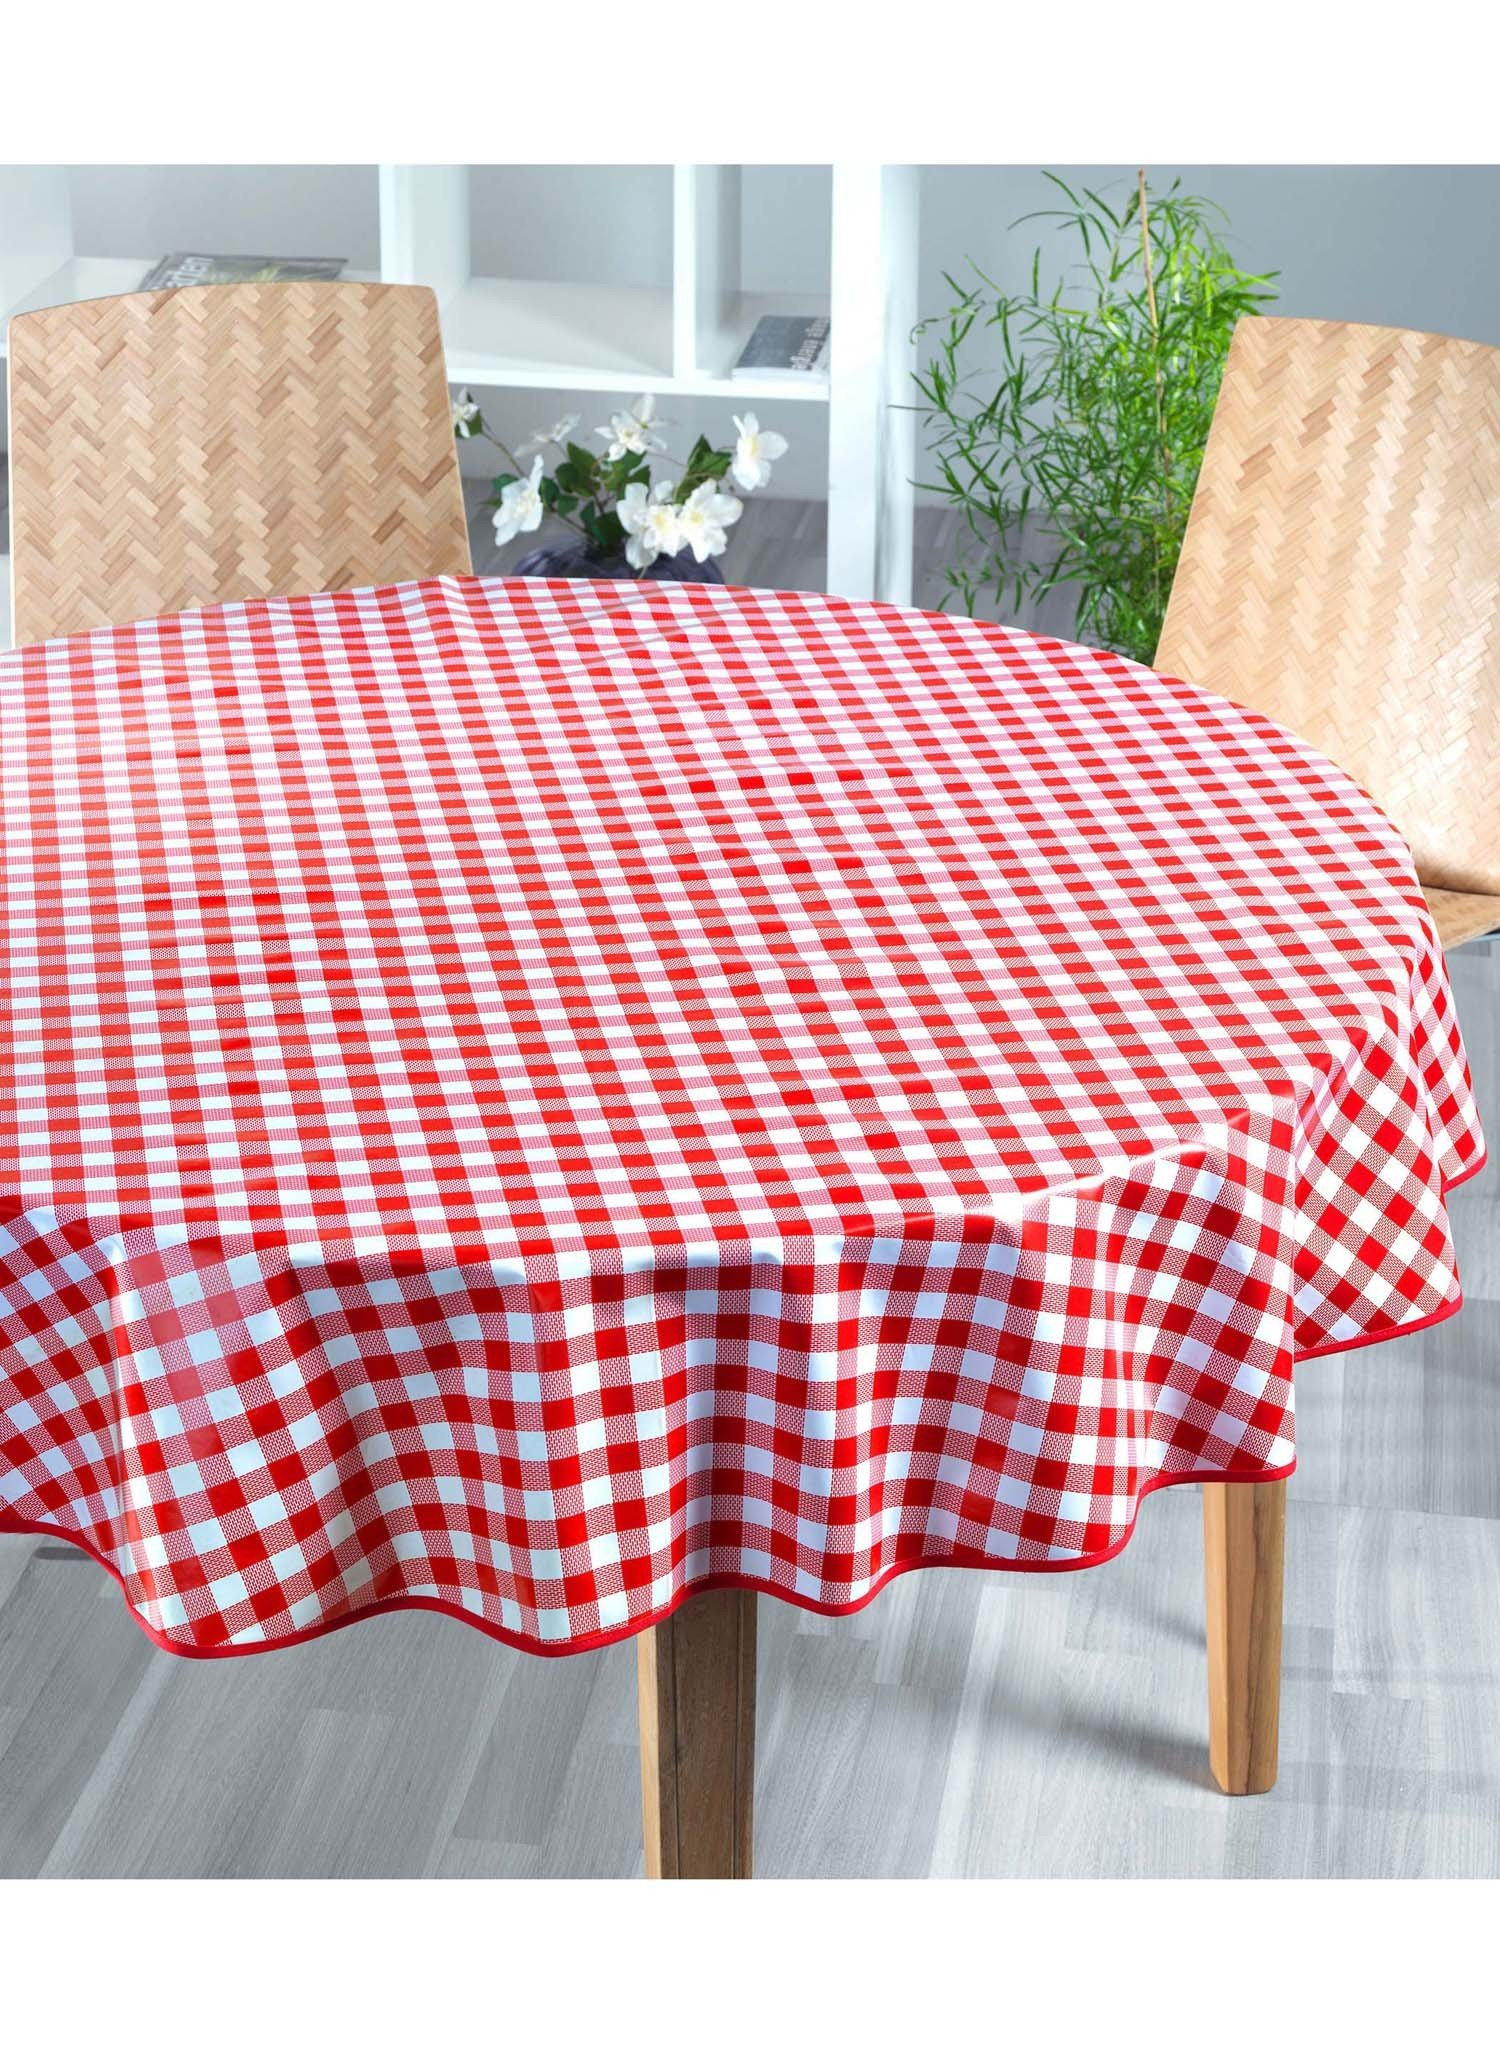 Tischdecke,Kölsch rot 160cm - 2 - Ronja.ch